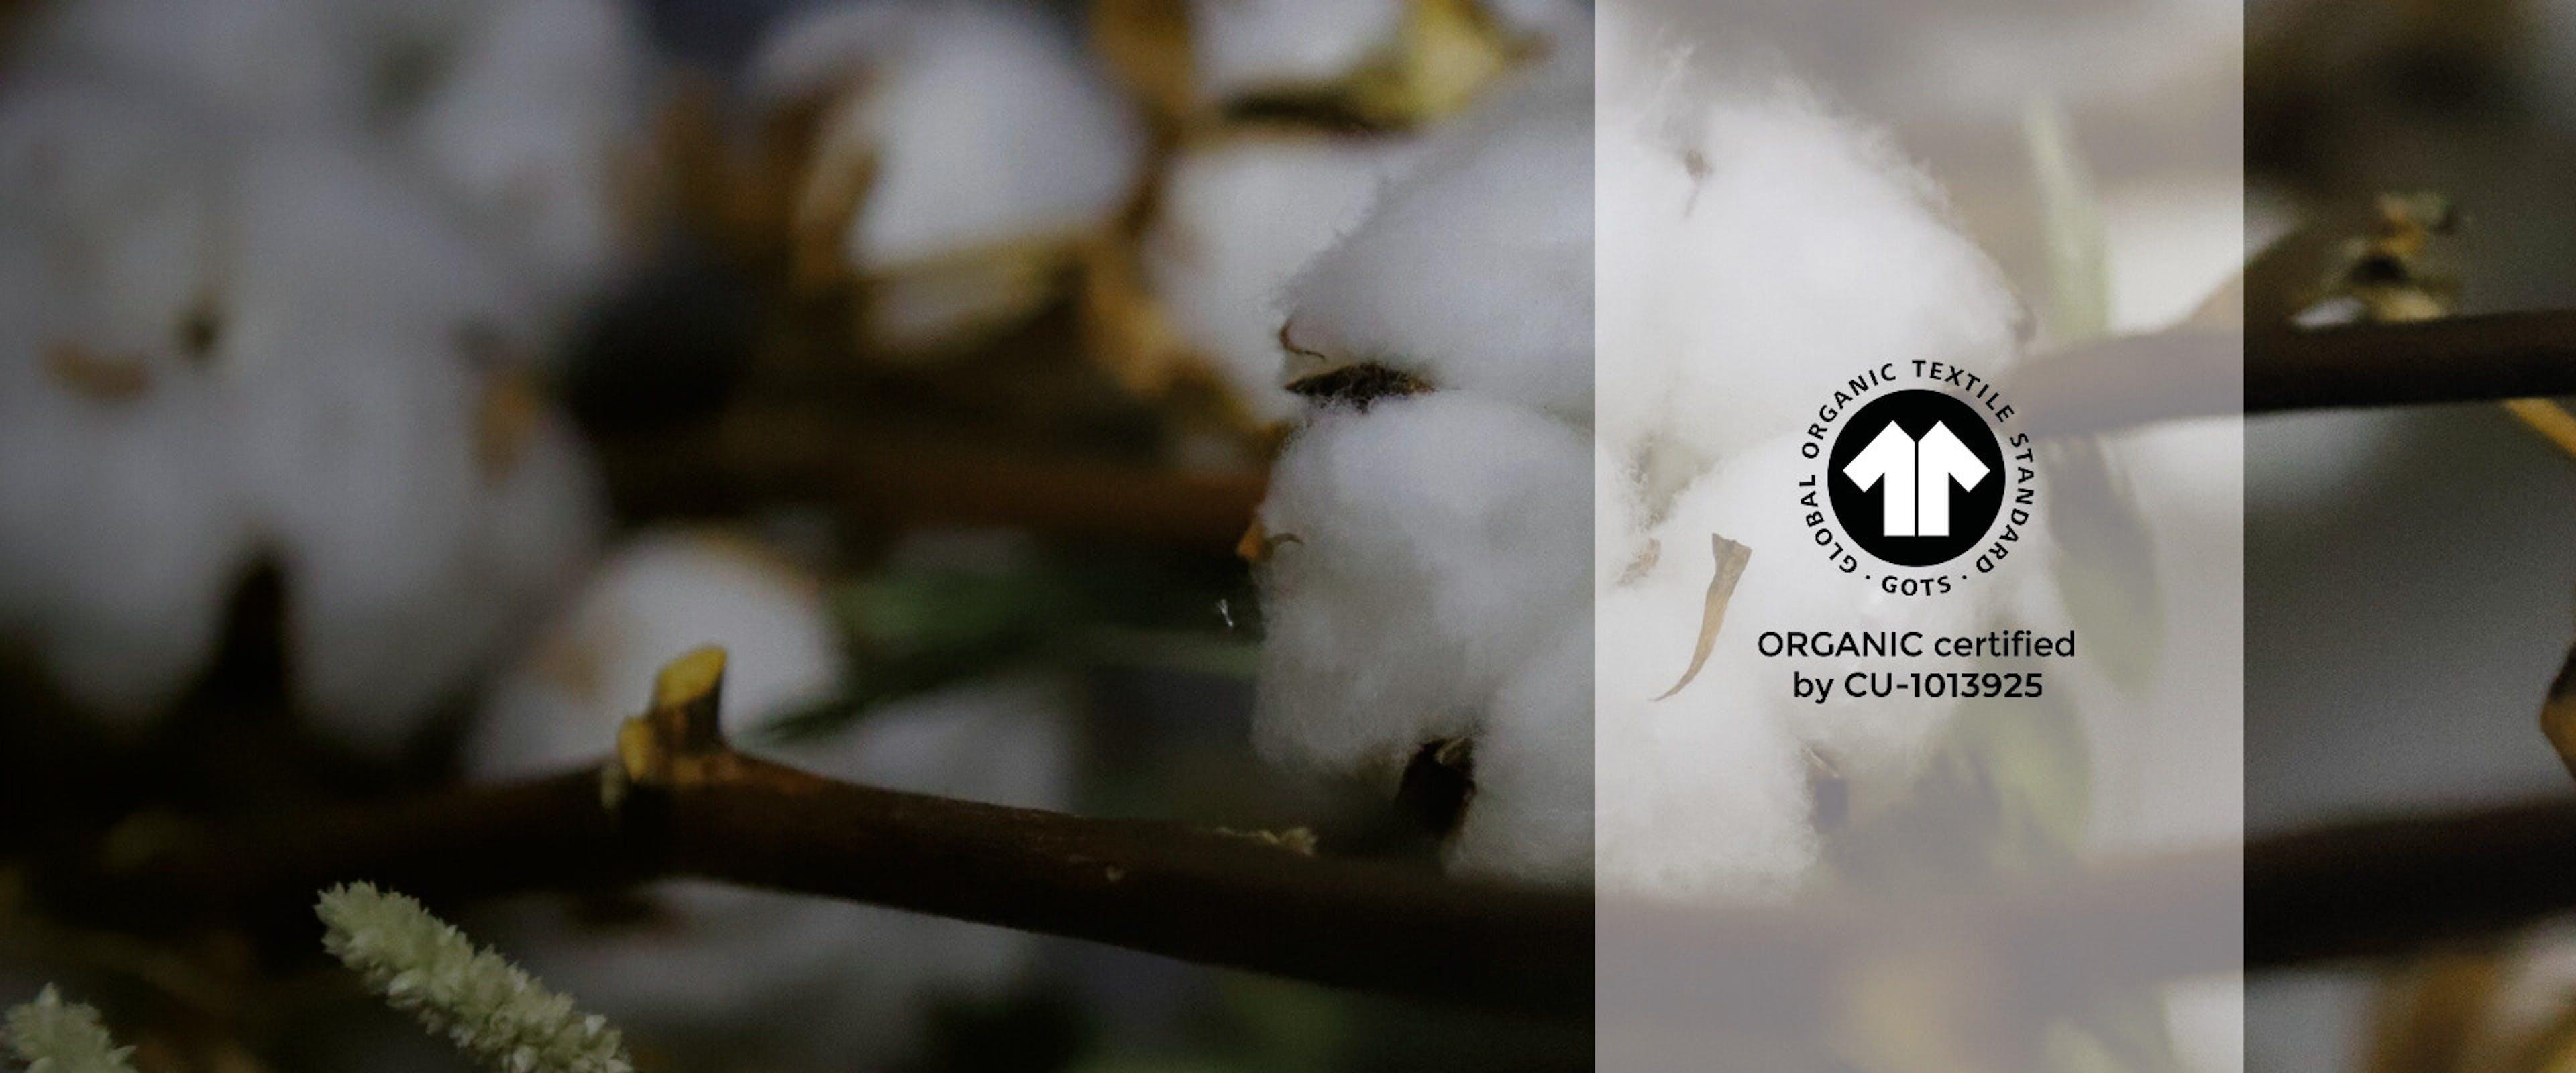 GOTS-certified organic cotton